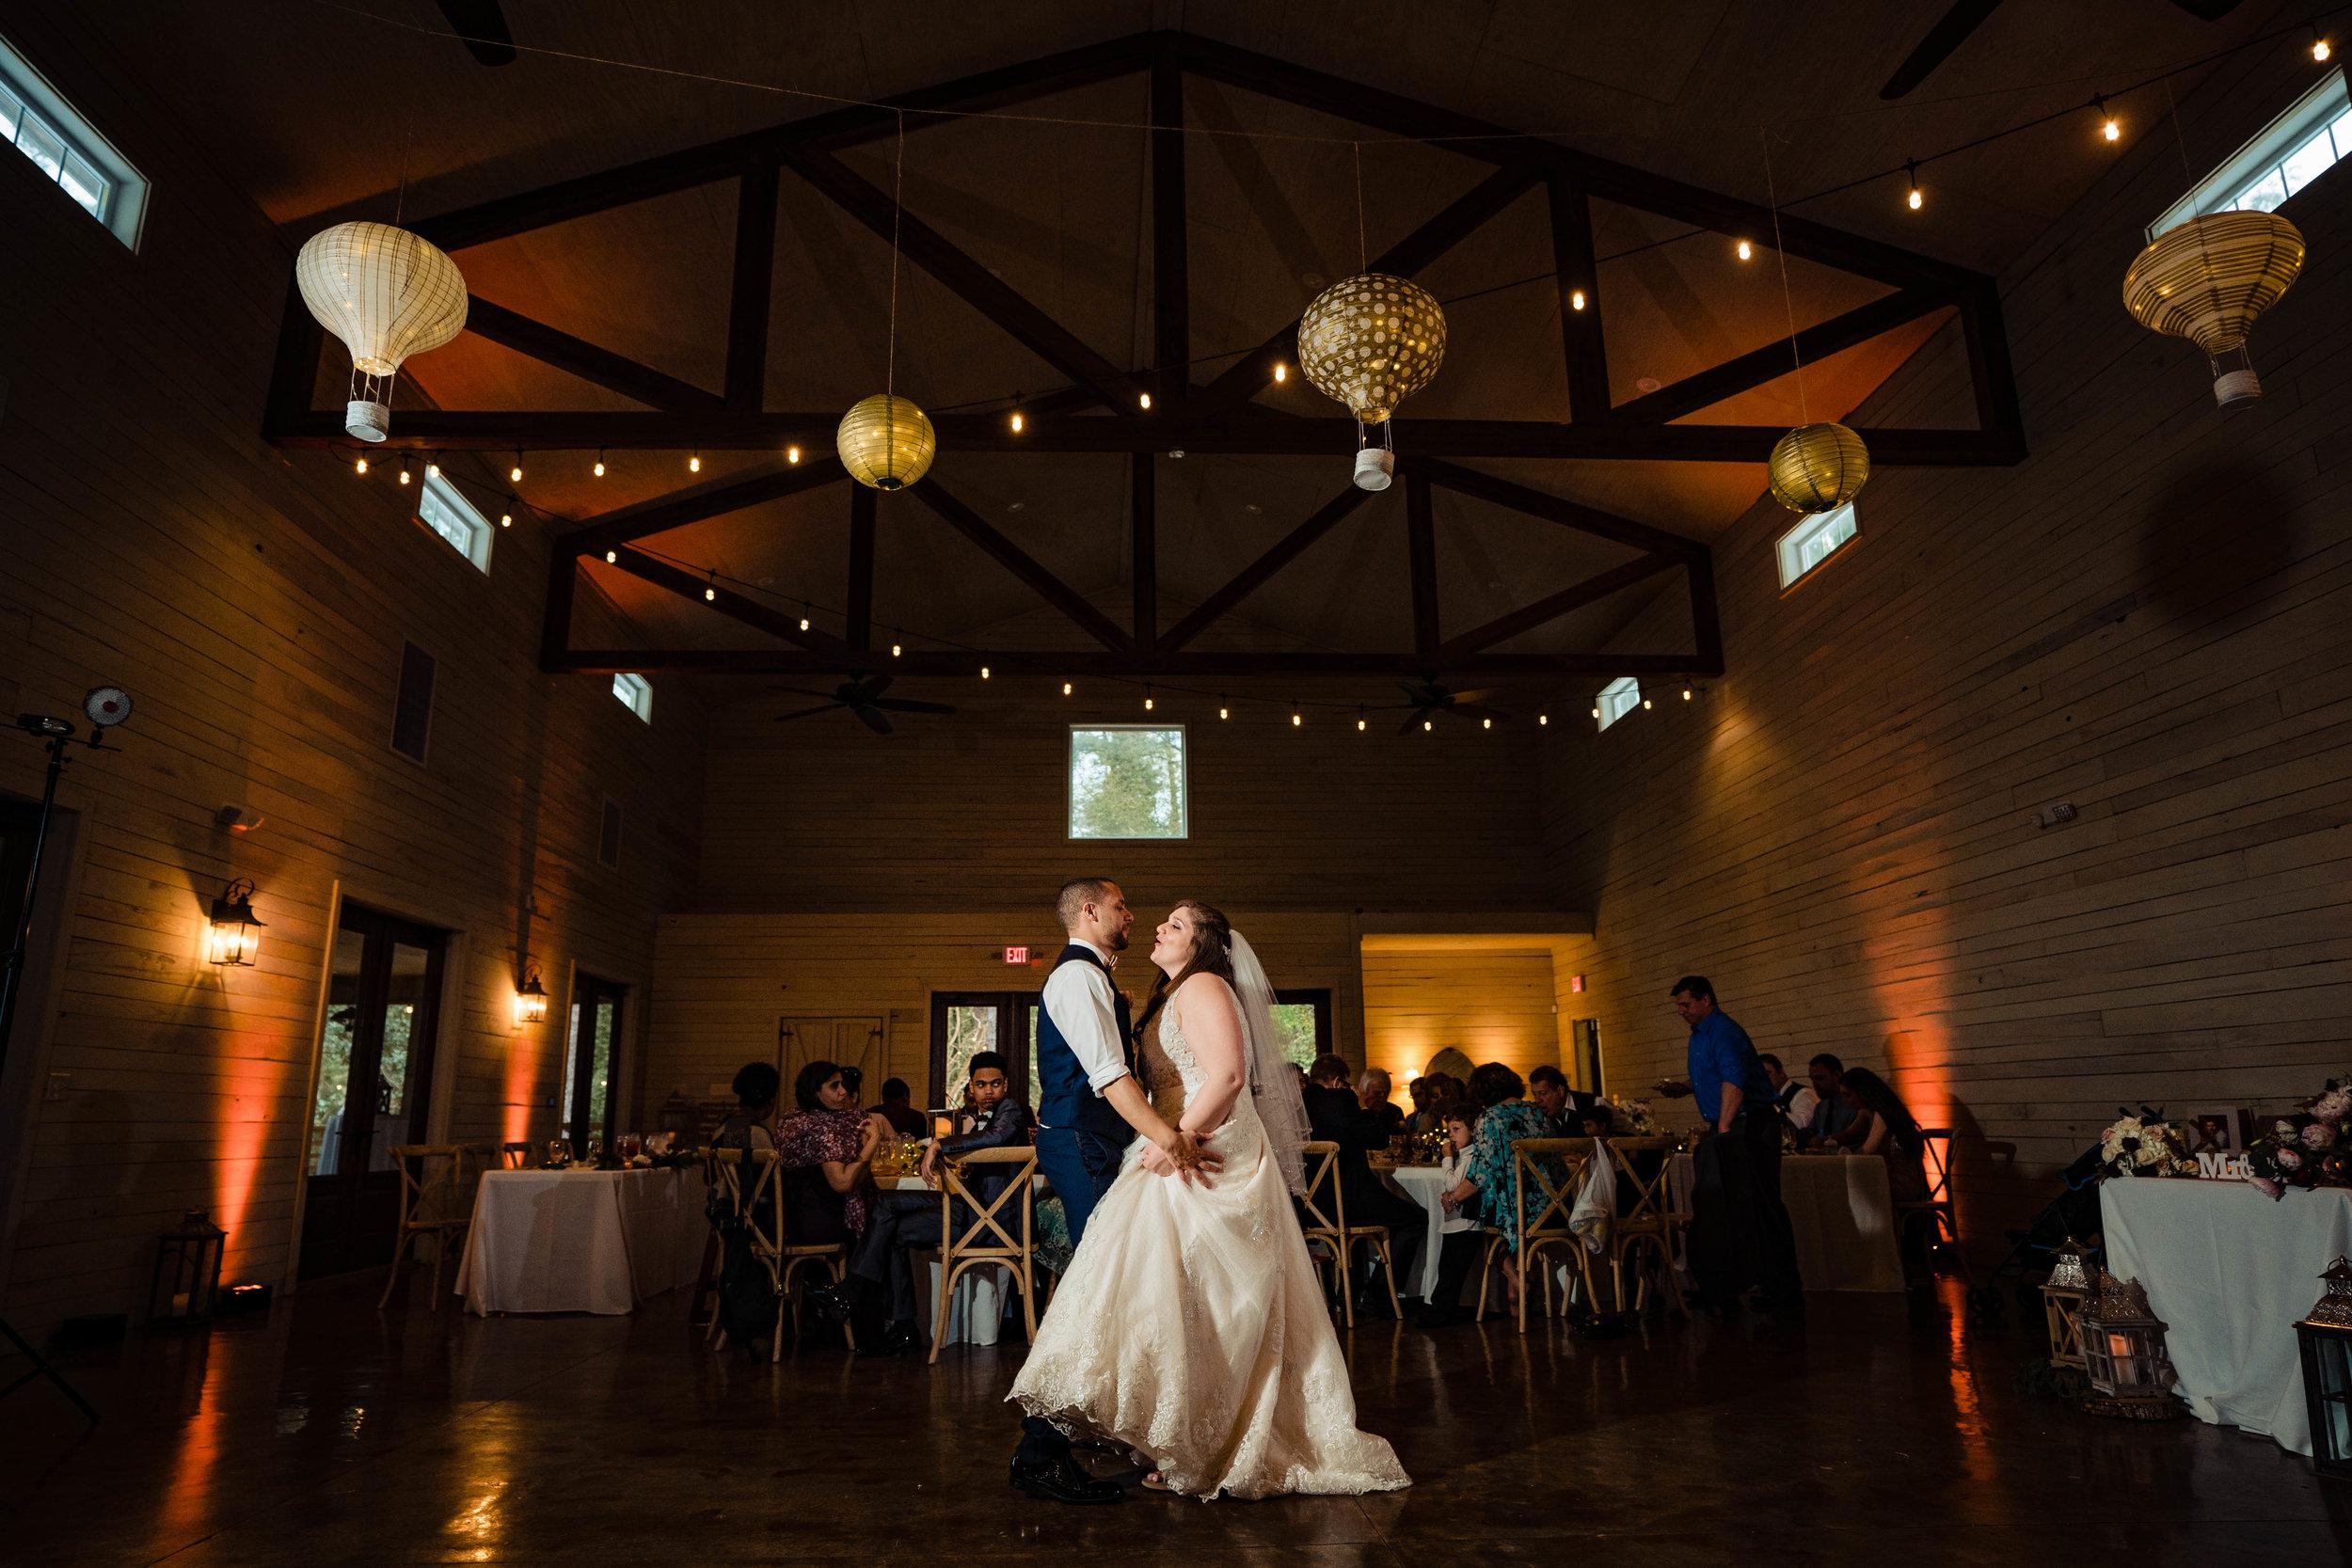 copper-ridge-on-the-neuse-wedding-001tephanie&Roberto-Wedding-574.jpg